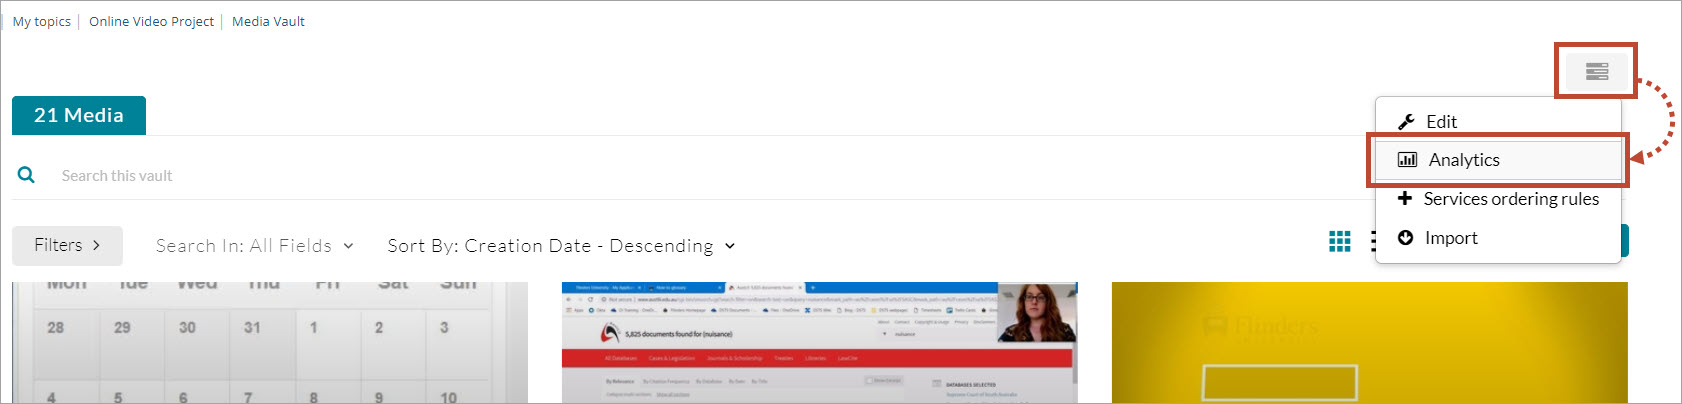 open menu select Analytics